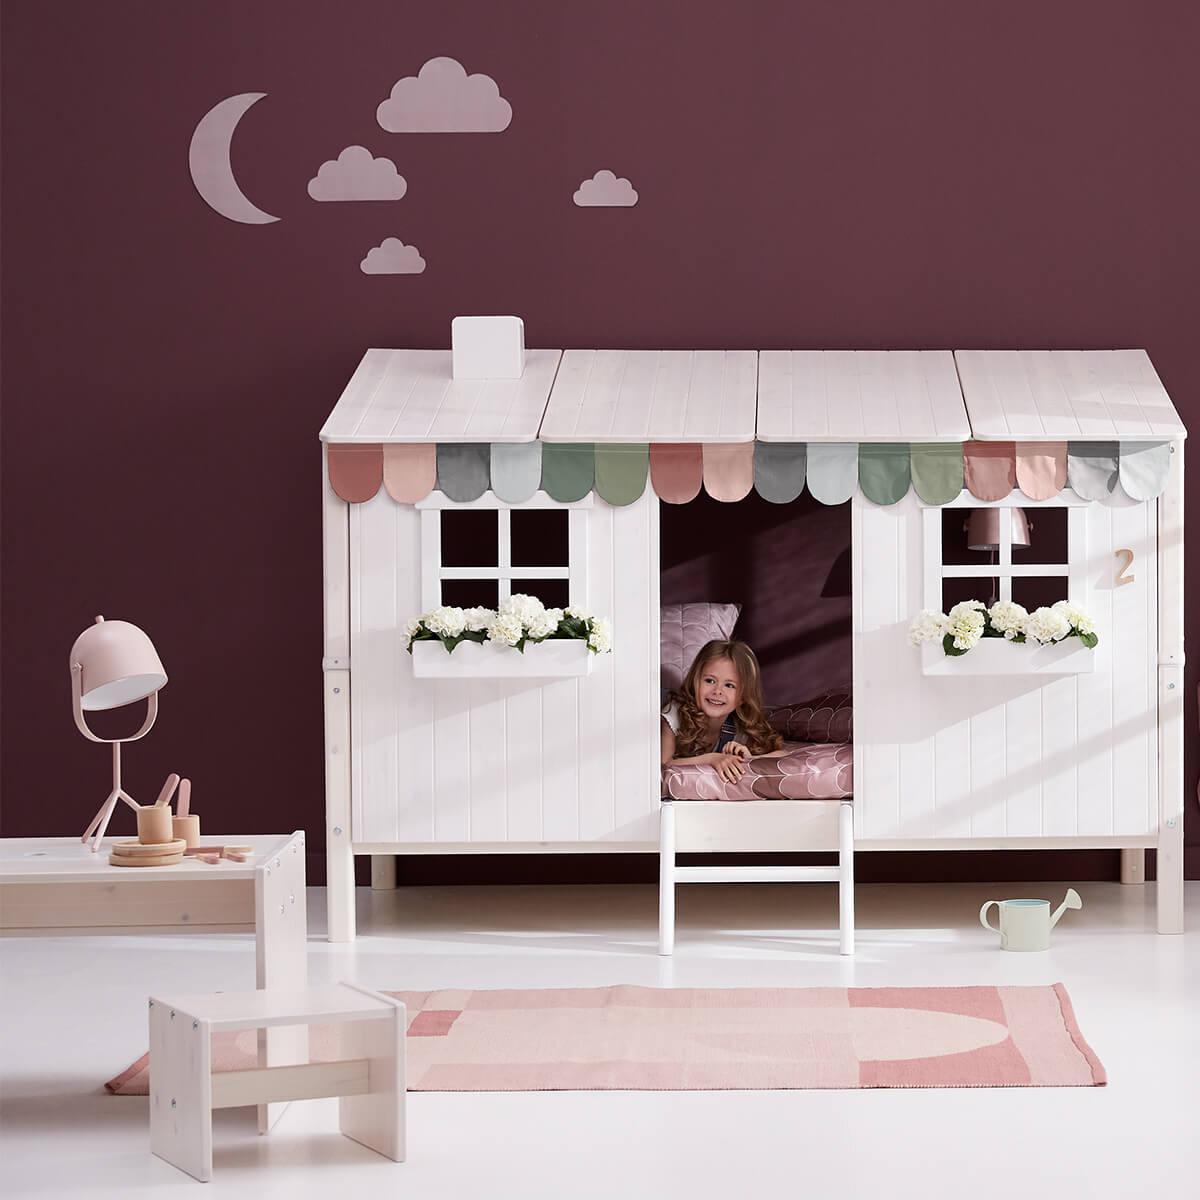 Spielbett Baumhaus 90x200cm 1/2 PLAY HOUSE CLASSIC Flexa terra-weiß